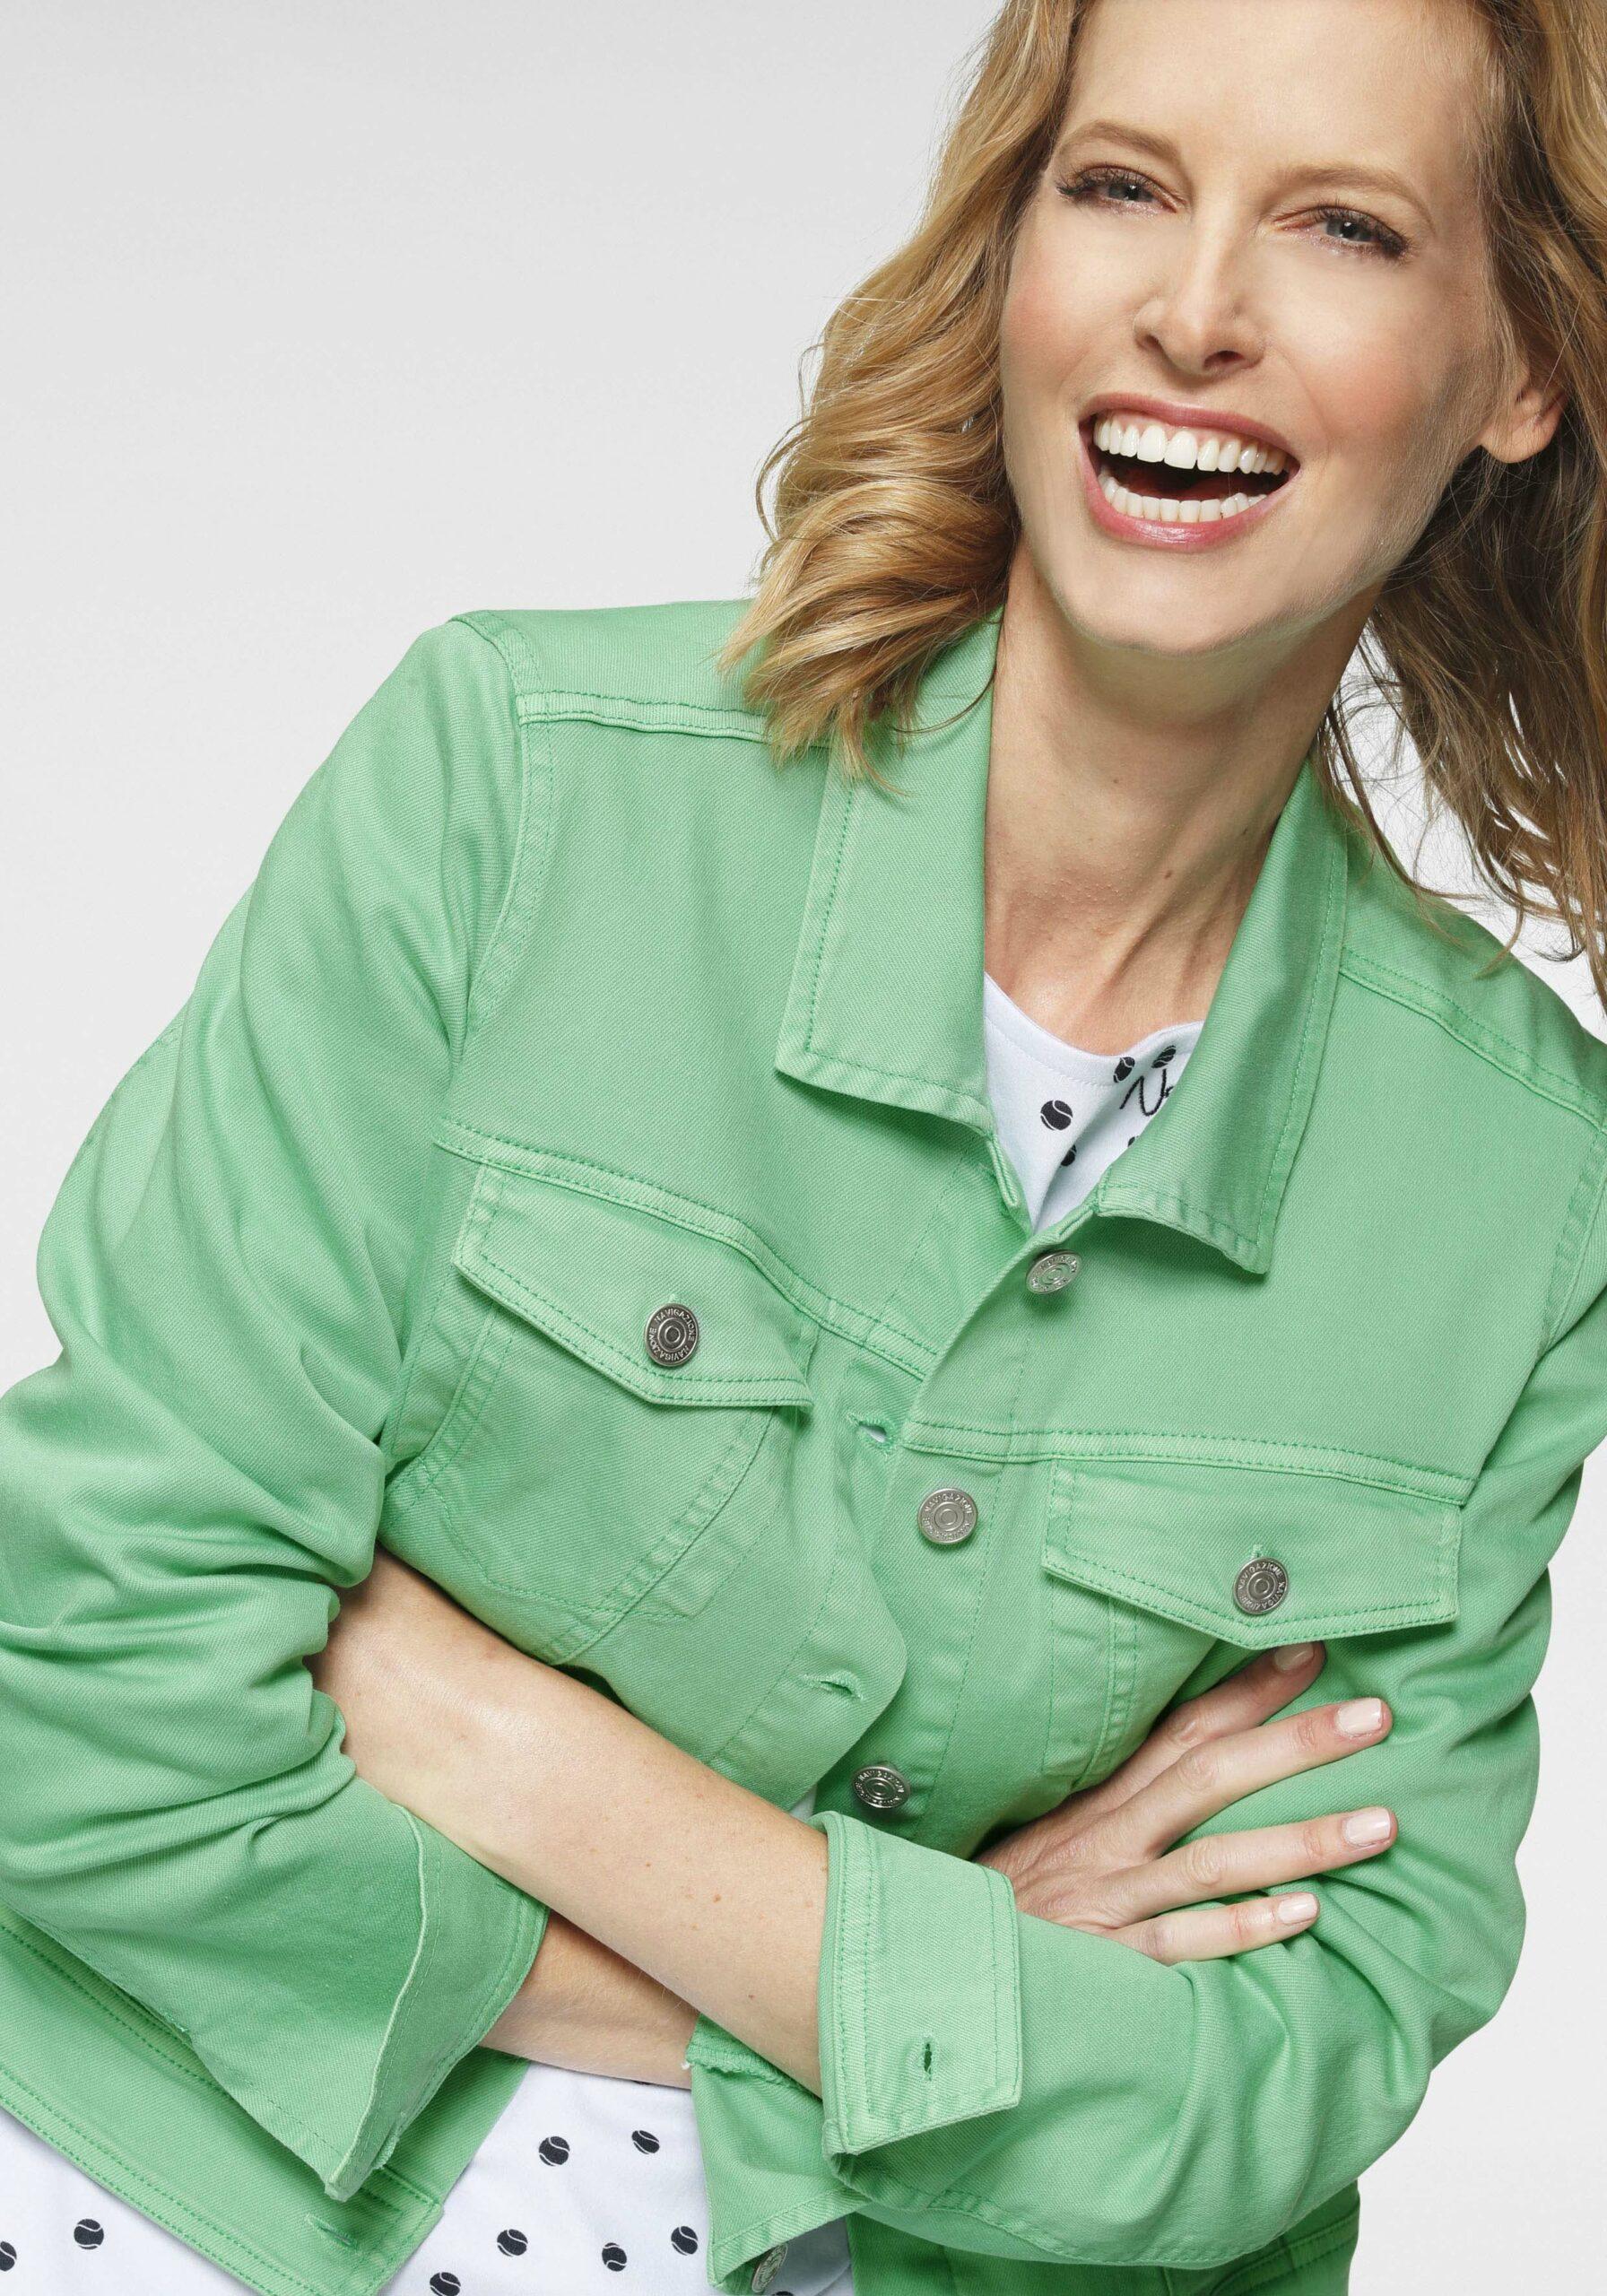 Damen Modische Jeansjacke Grün